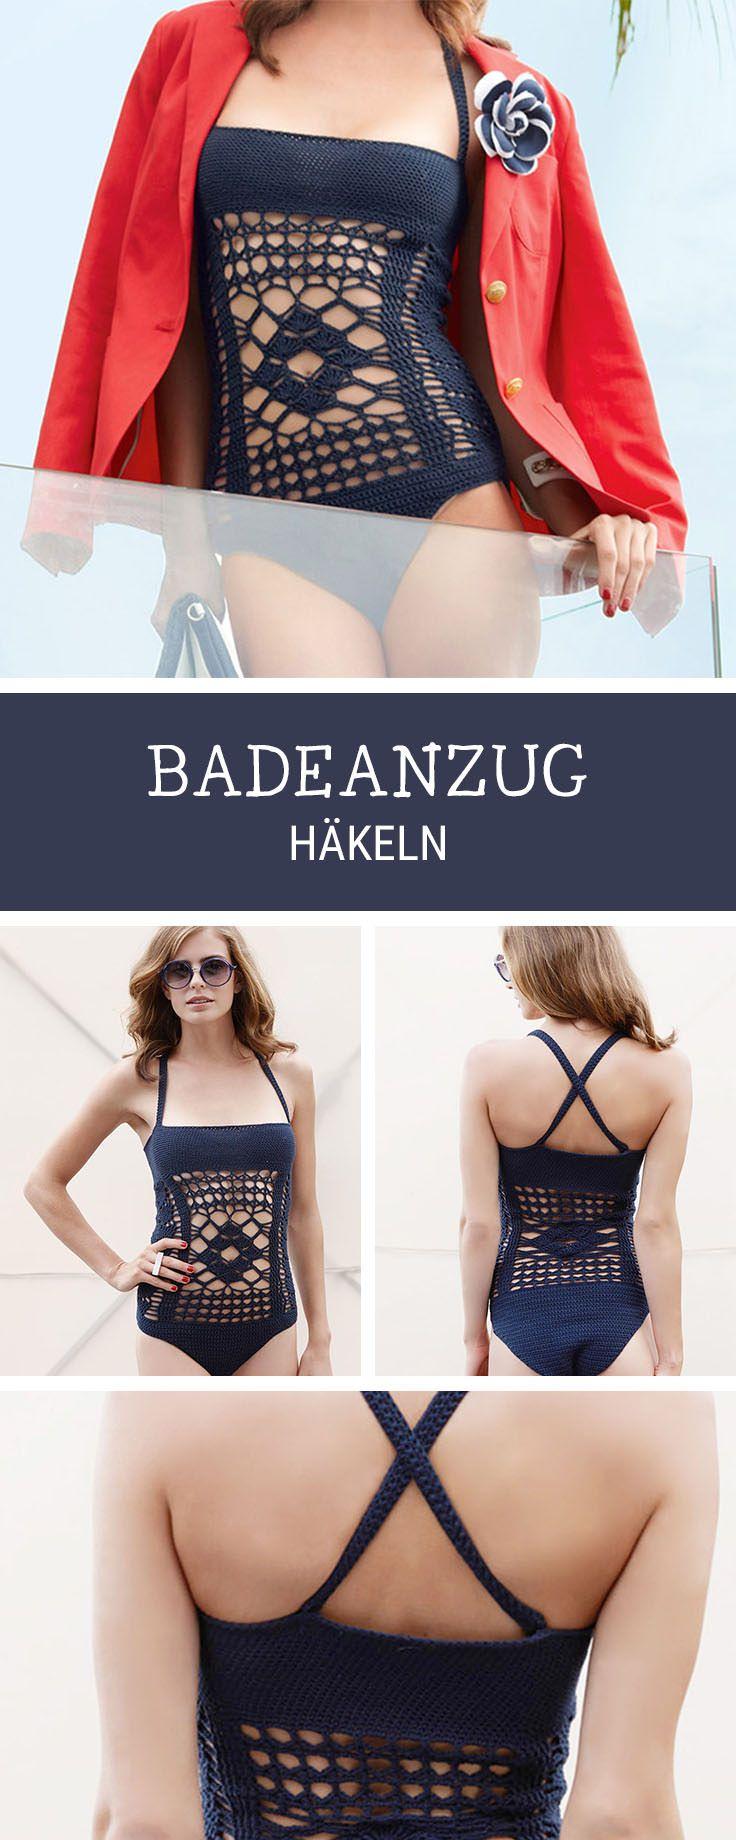 Badeanzug häkeln mit Lochmuster, DIY-Inspiration für den Sommer / summerly crocheting diy: crocheted swimsuit, trend diy via DaWanda.com